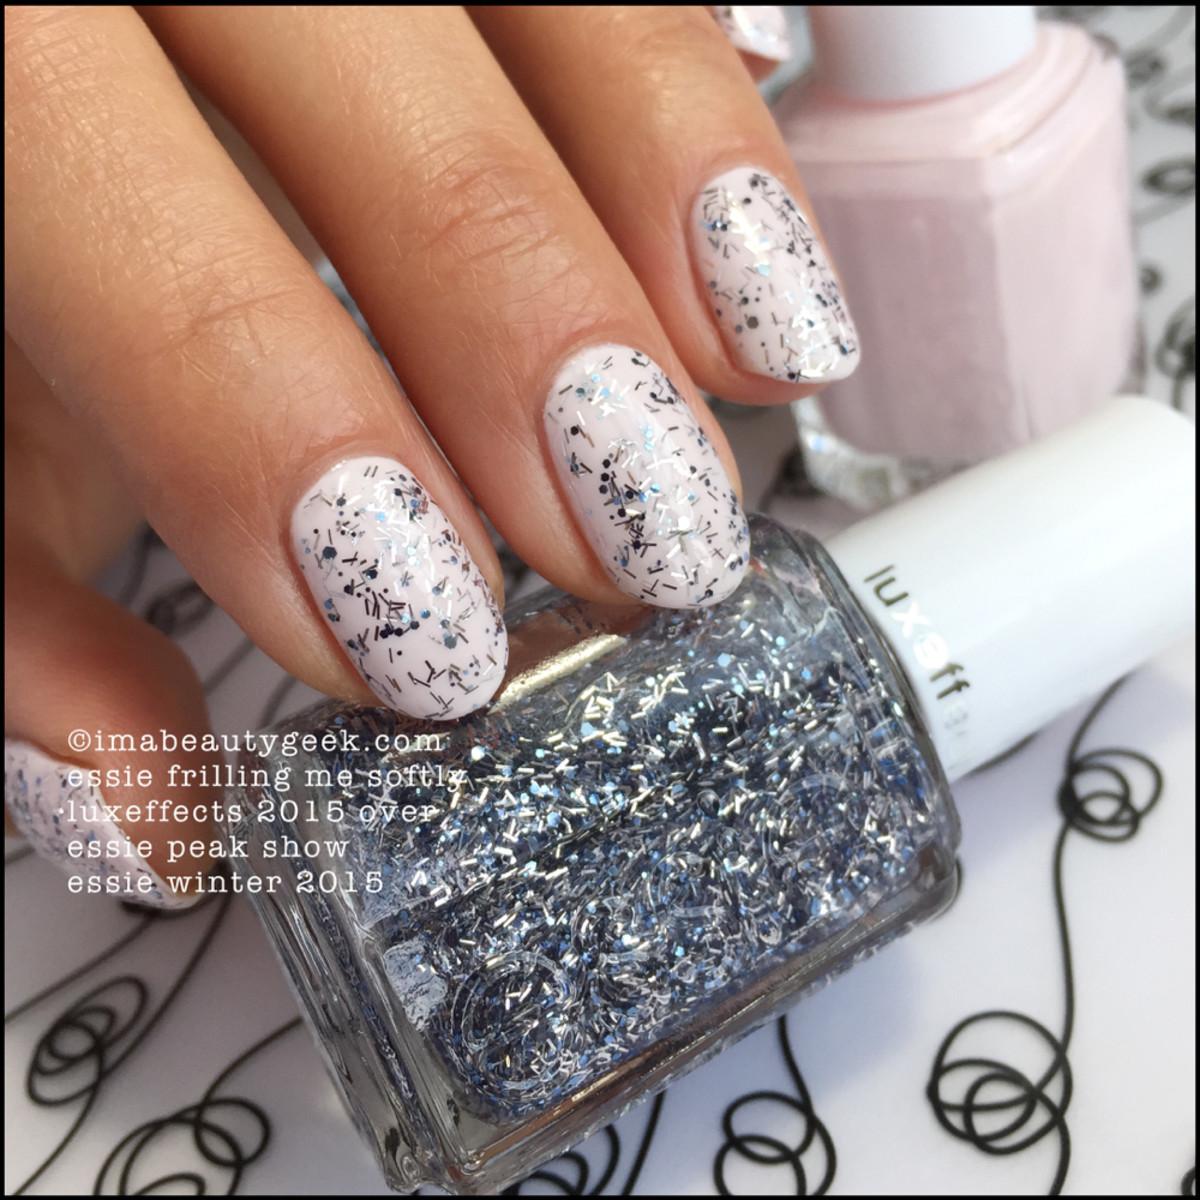 Best Essie Glitter Nail Polish - Creative Touch